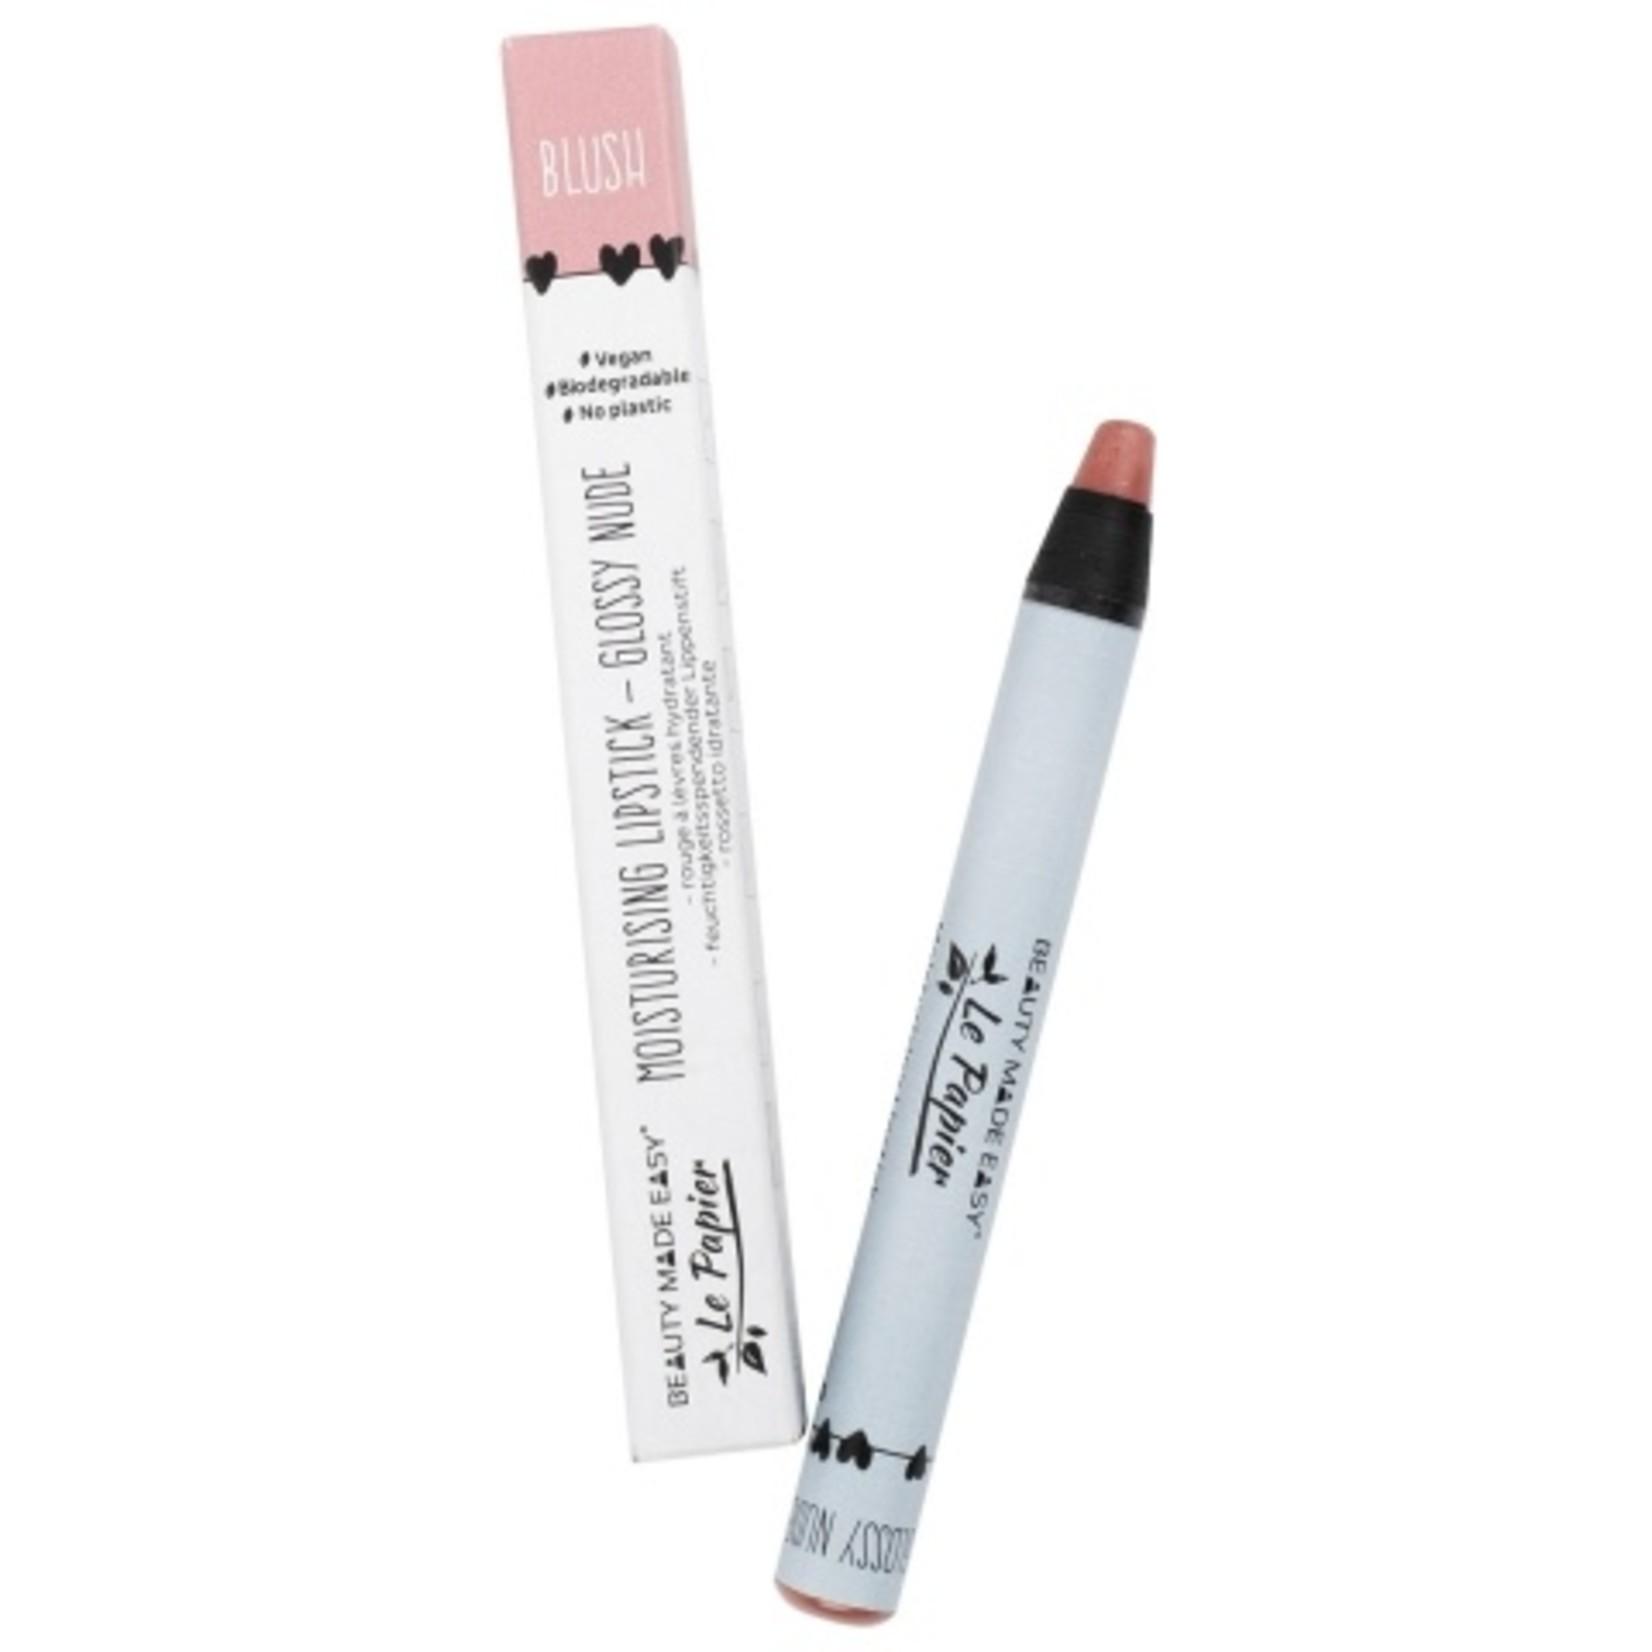 Voedende lipstick - Glossy Nudes - BLOSSOM - 6 g